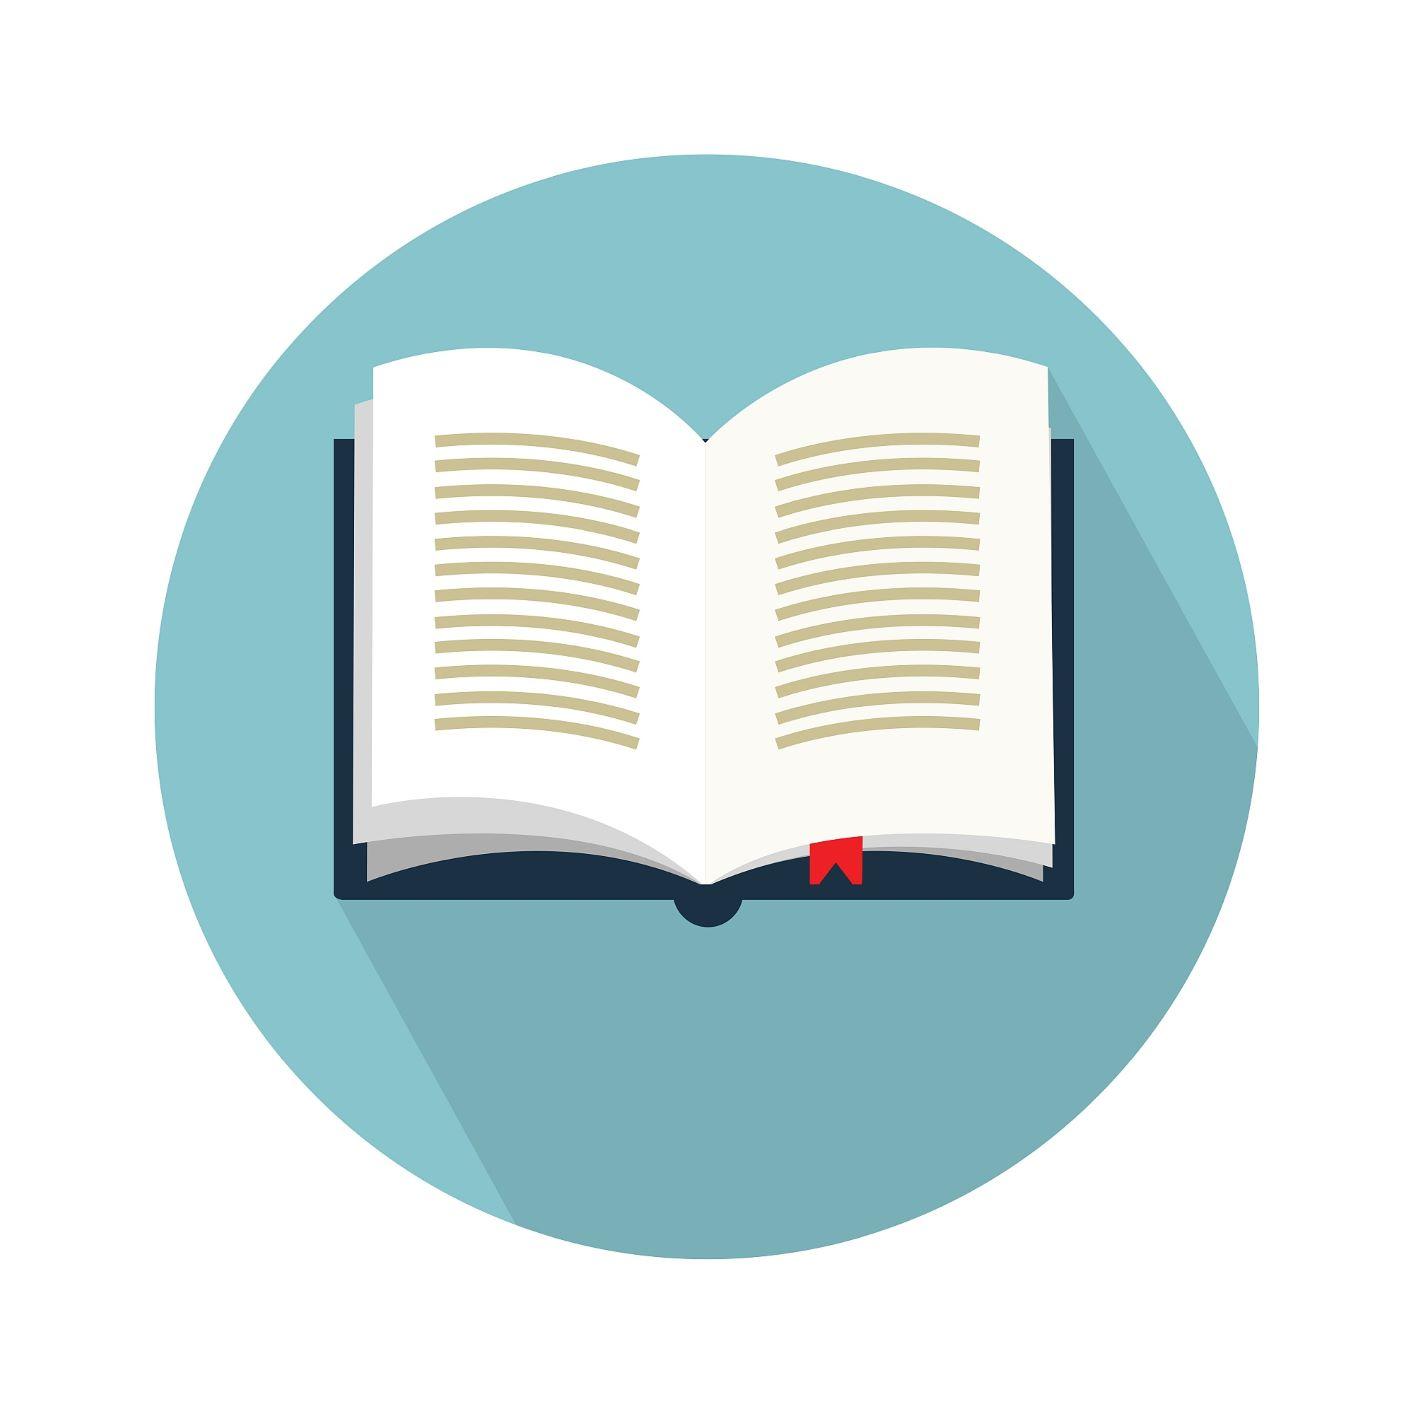 Discover English 3 książka ucznia